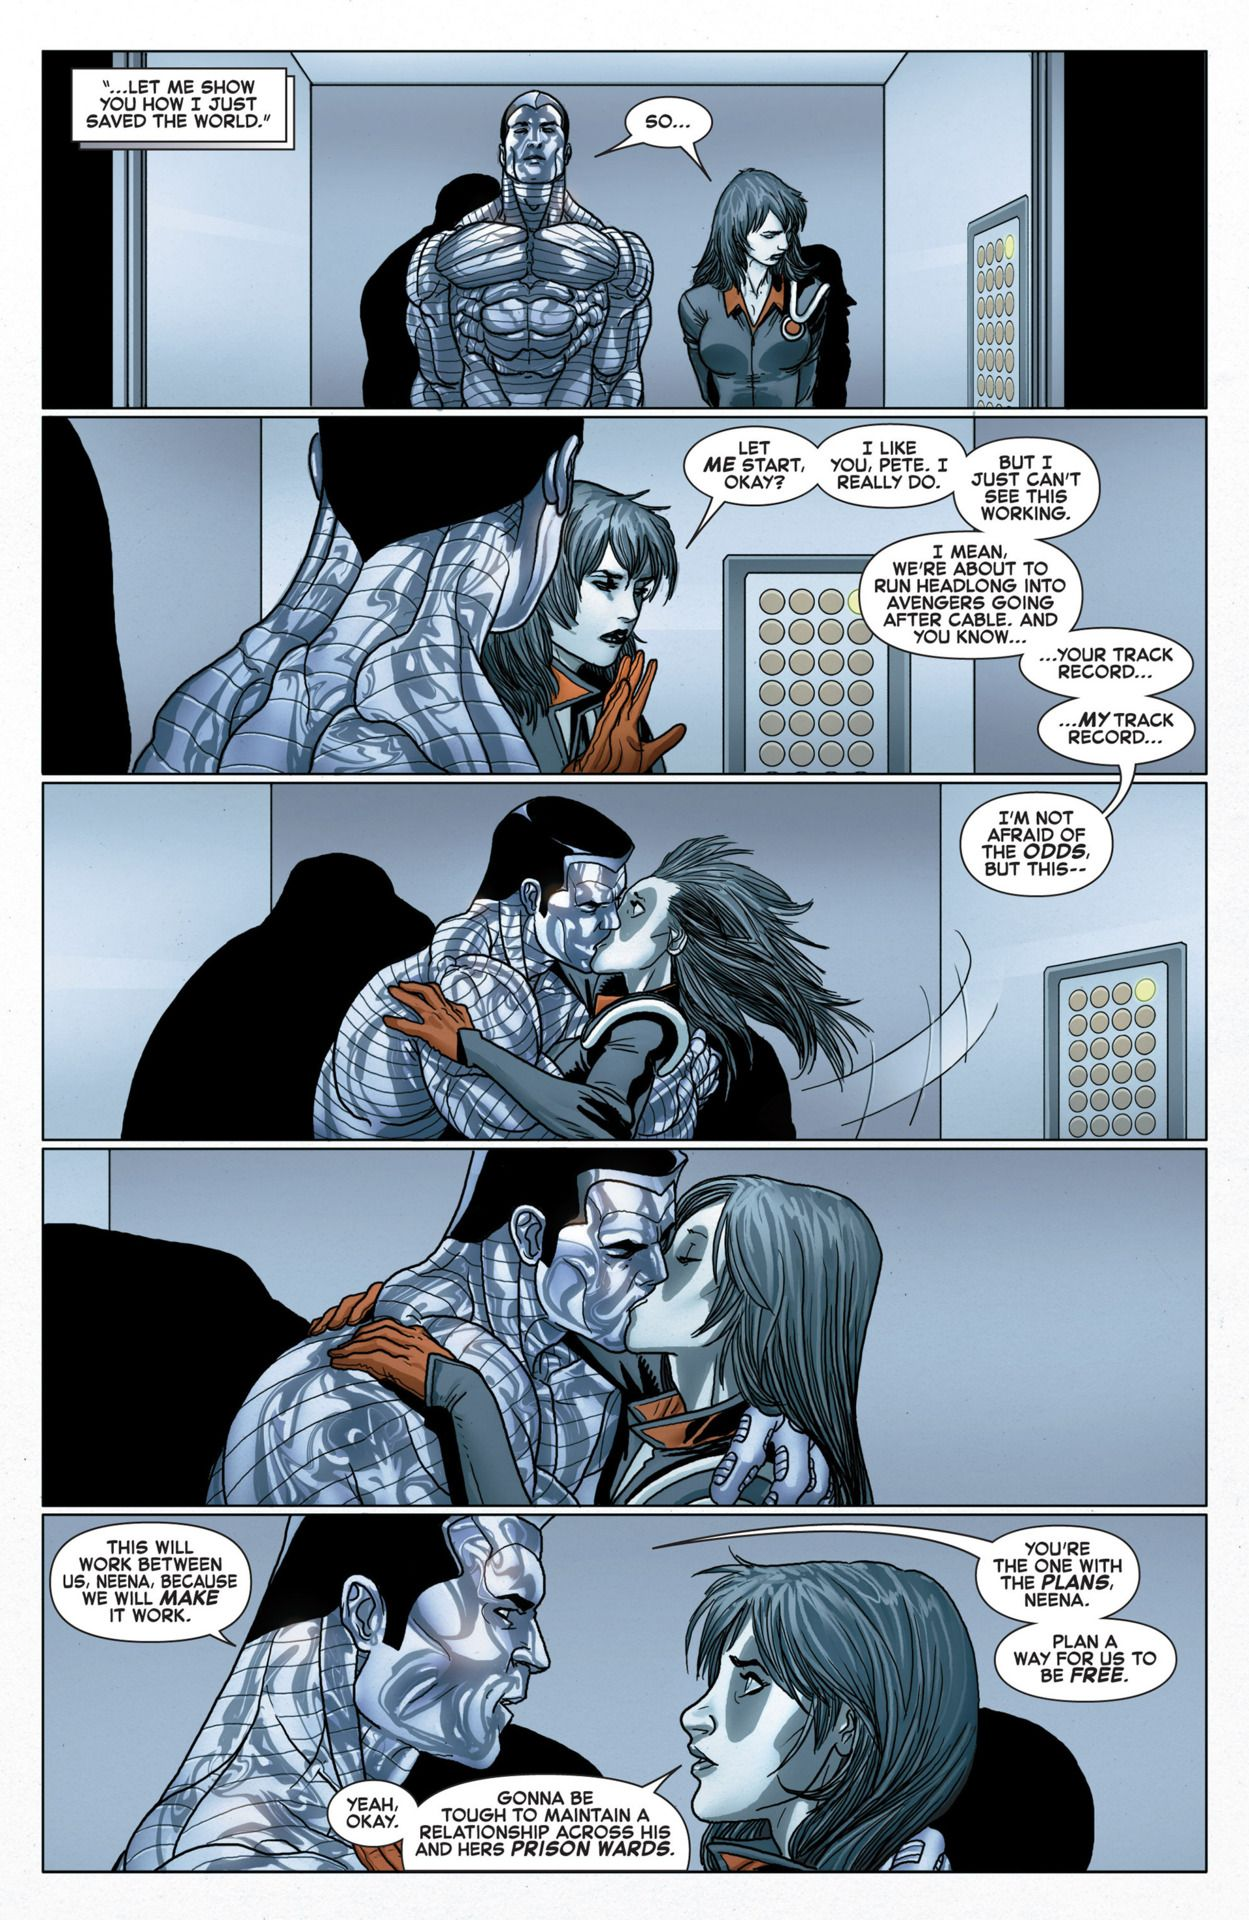 Domino marvel relationships dating